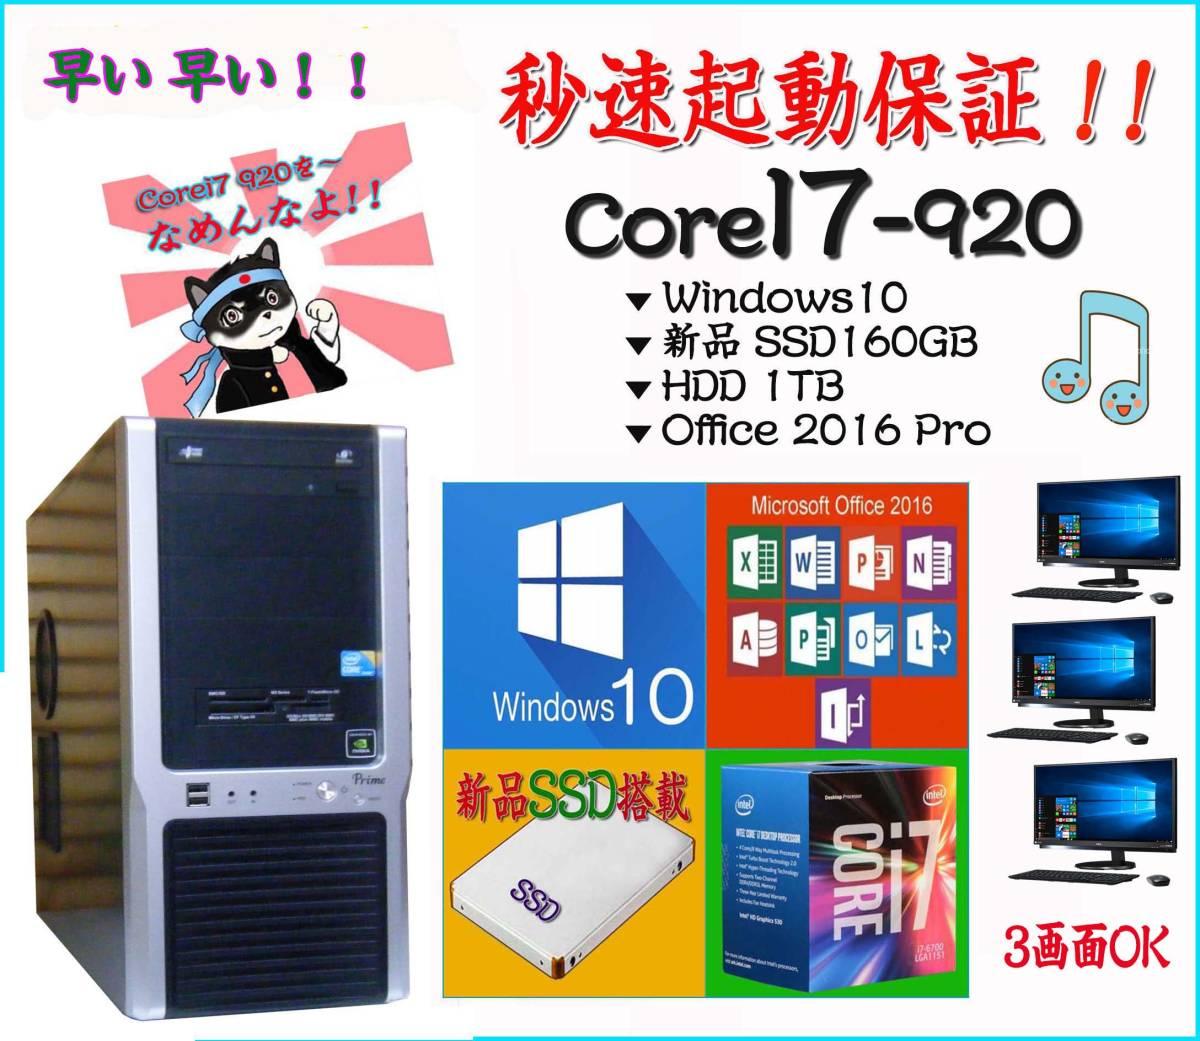 ◆ 秒速/i7 920/自作Prime X58/新品SSD 160GB/HDD 1TB/Office2016/Win10キー付 ◆